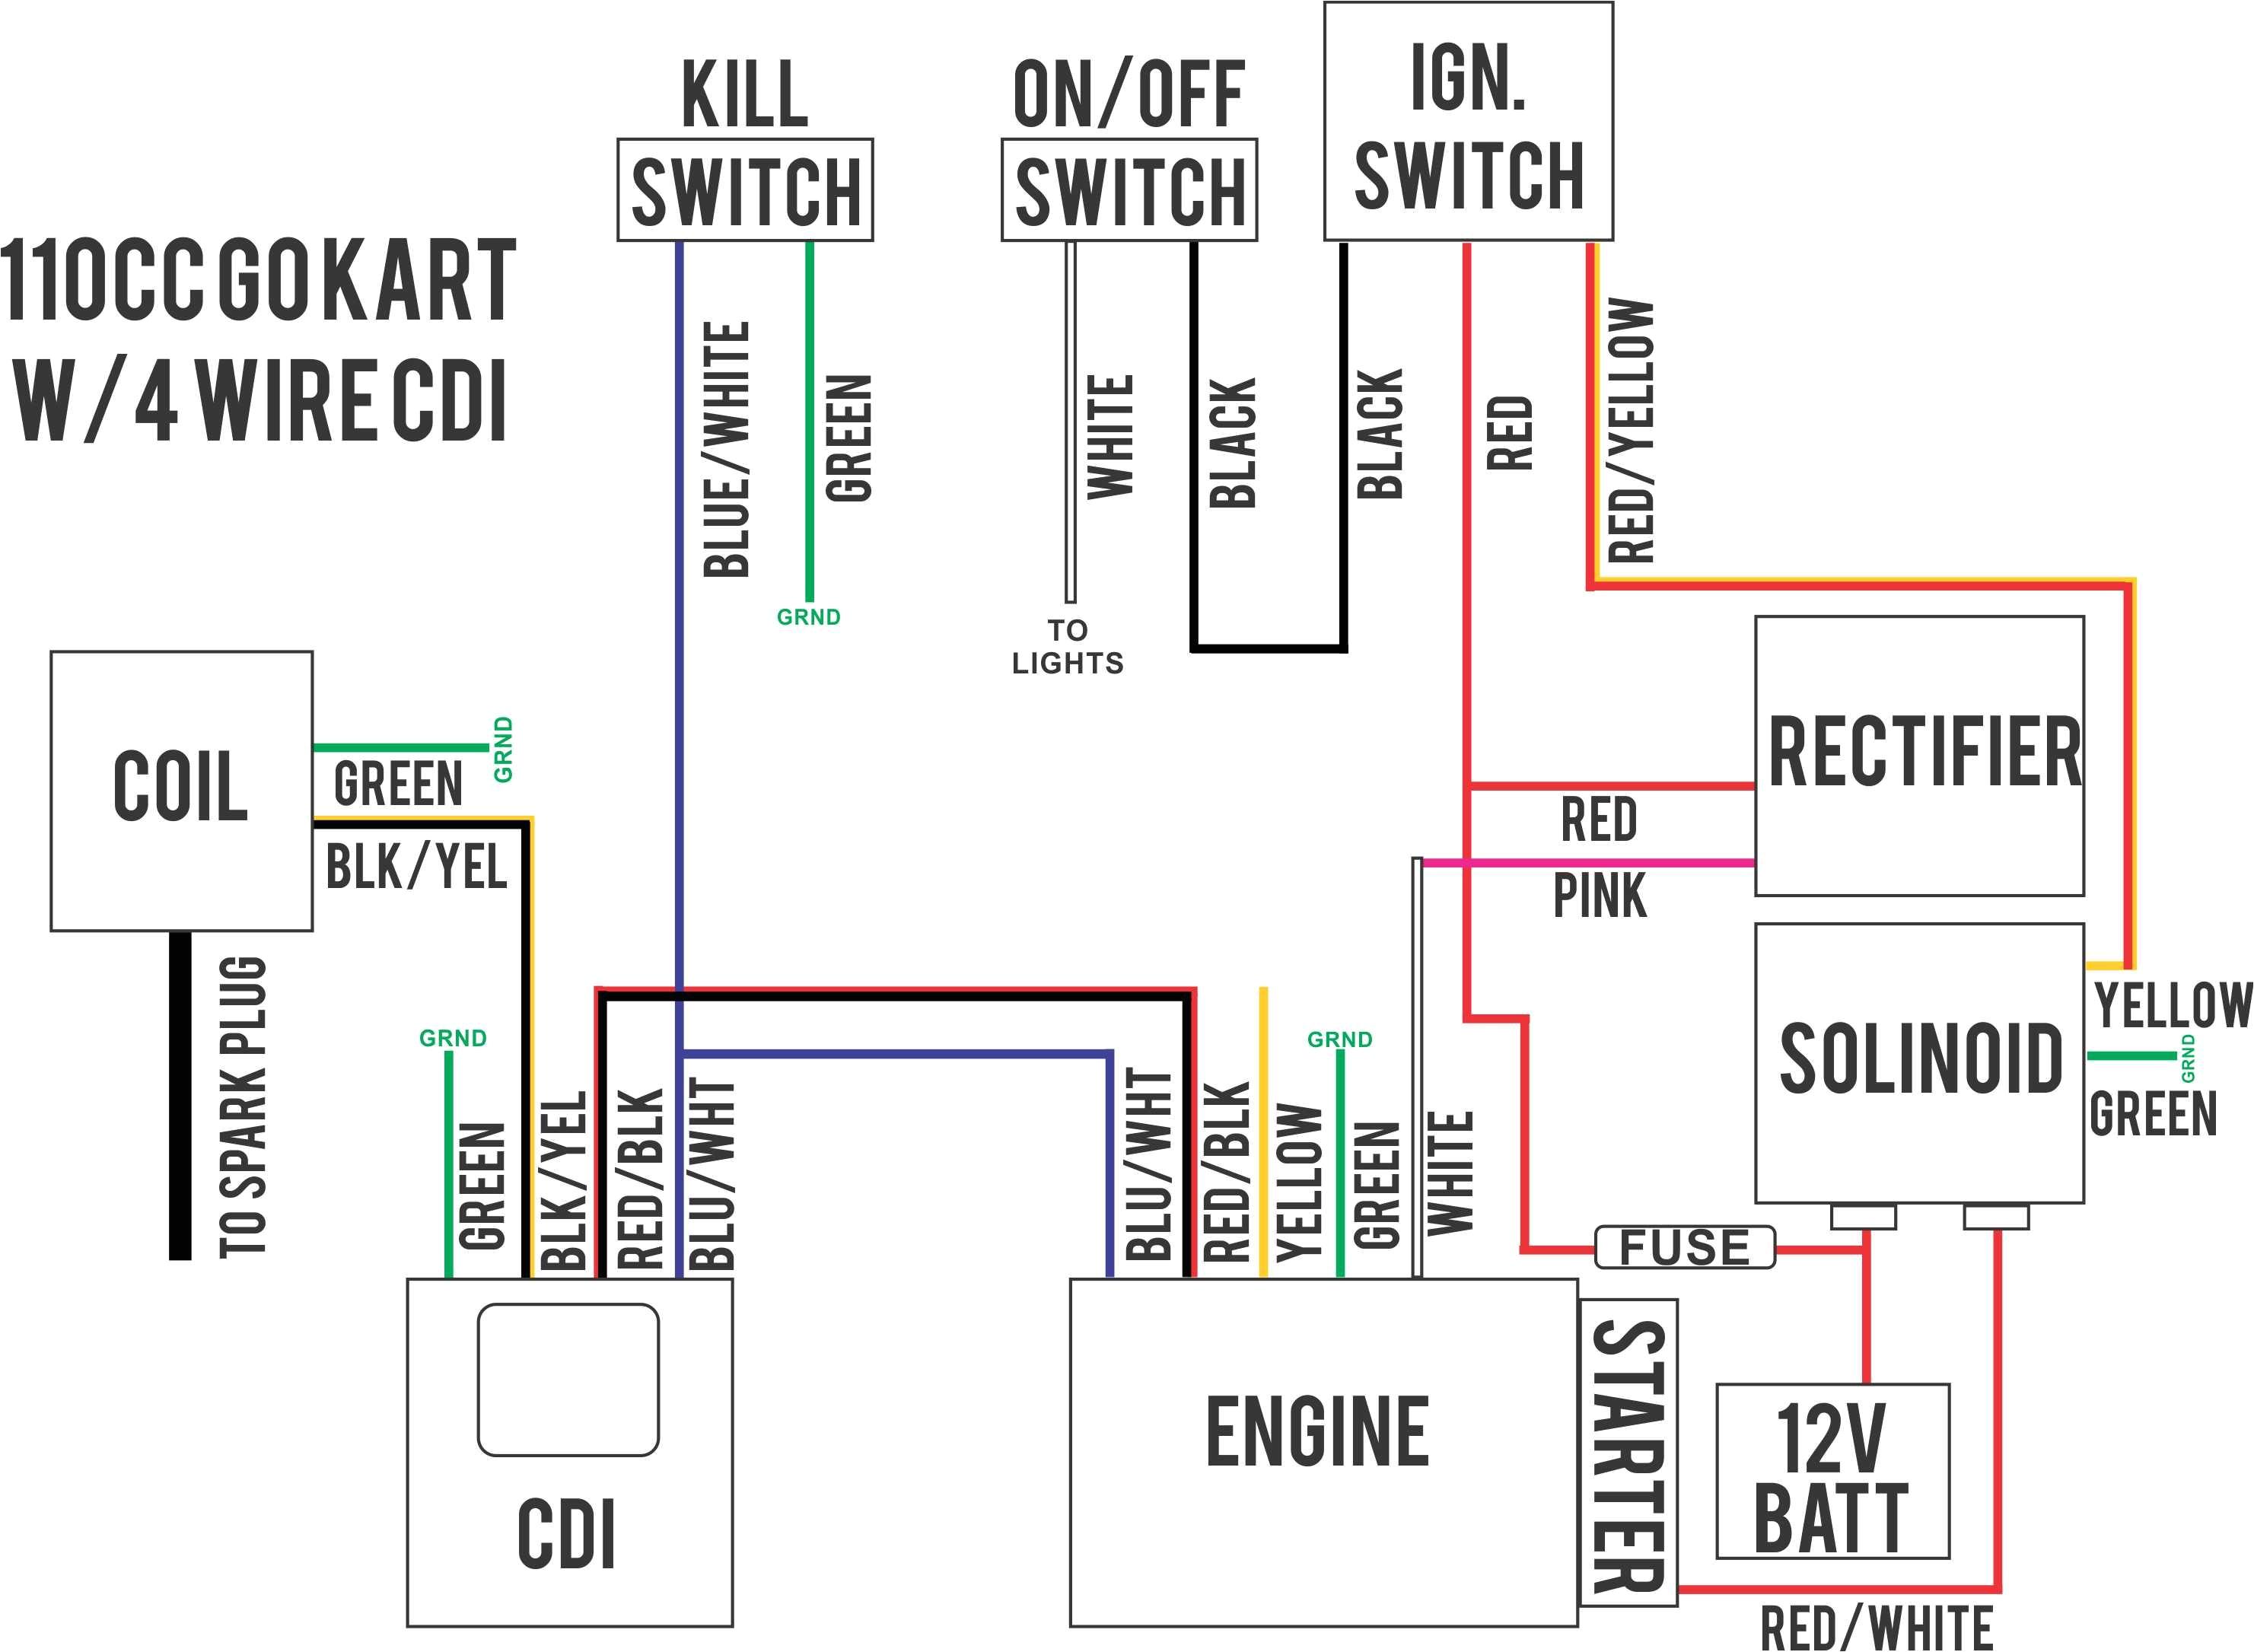 50cc atv cdi wiring plug wiring diagram mega 50cc cdi wiring diagram 50cc cdi wiring diagram